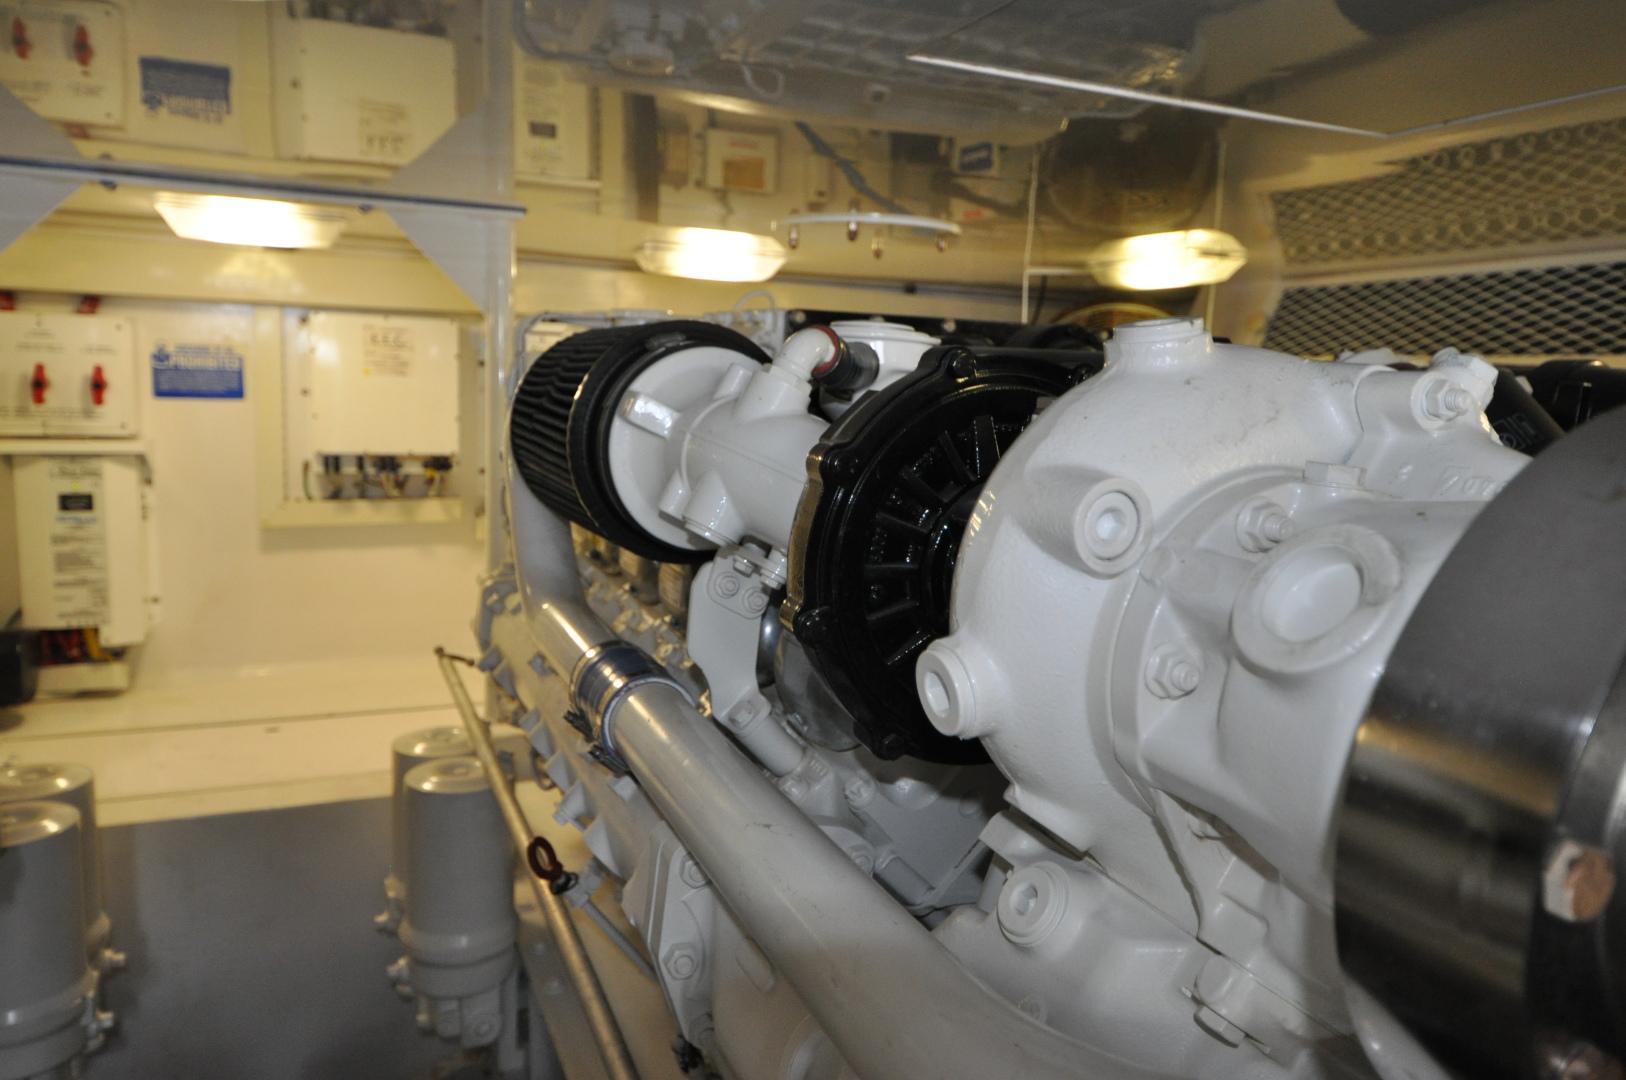 Viking-Convertible 2003-Reel Cowboy Deerfield Beach-Florida-United States-Engine Room-1546888 | Thumbnail